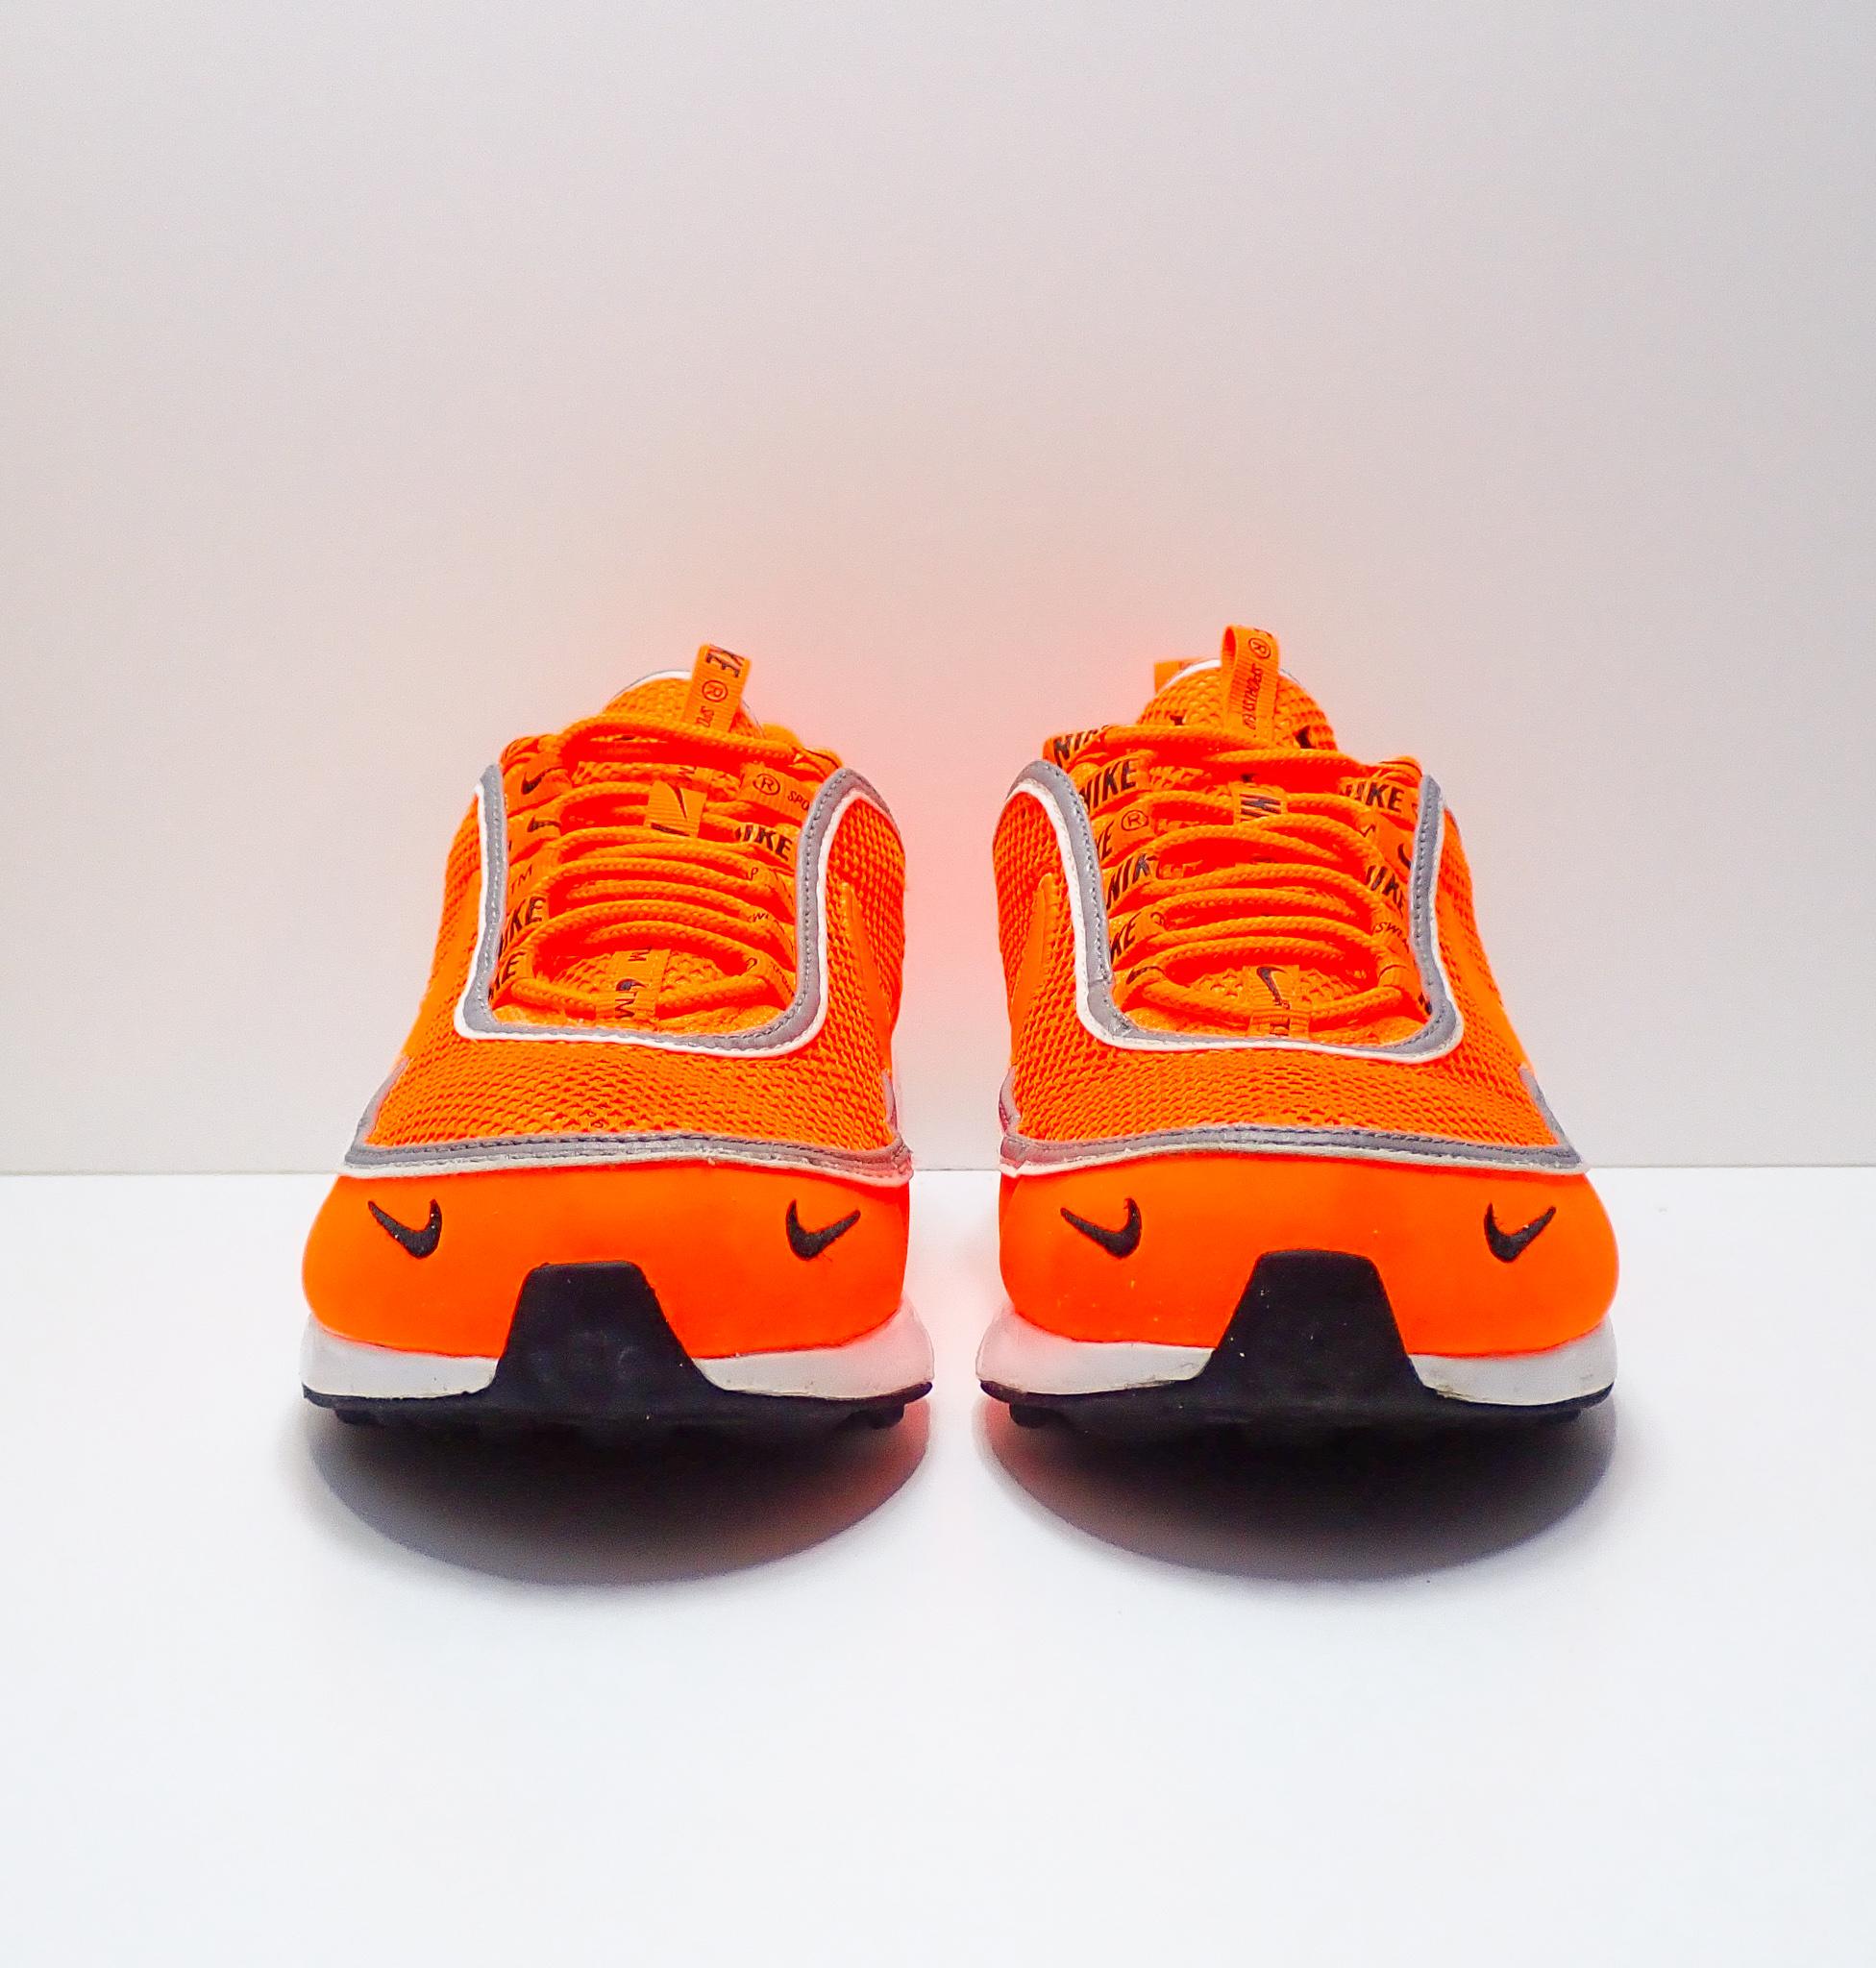 Nike Air Zoom Spiridon 16 Overbranding Total Orange